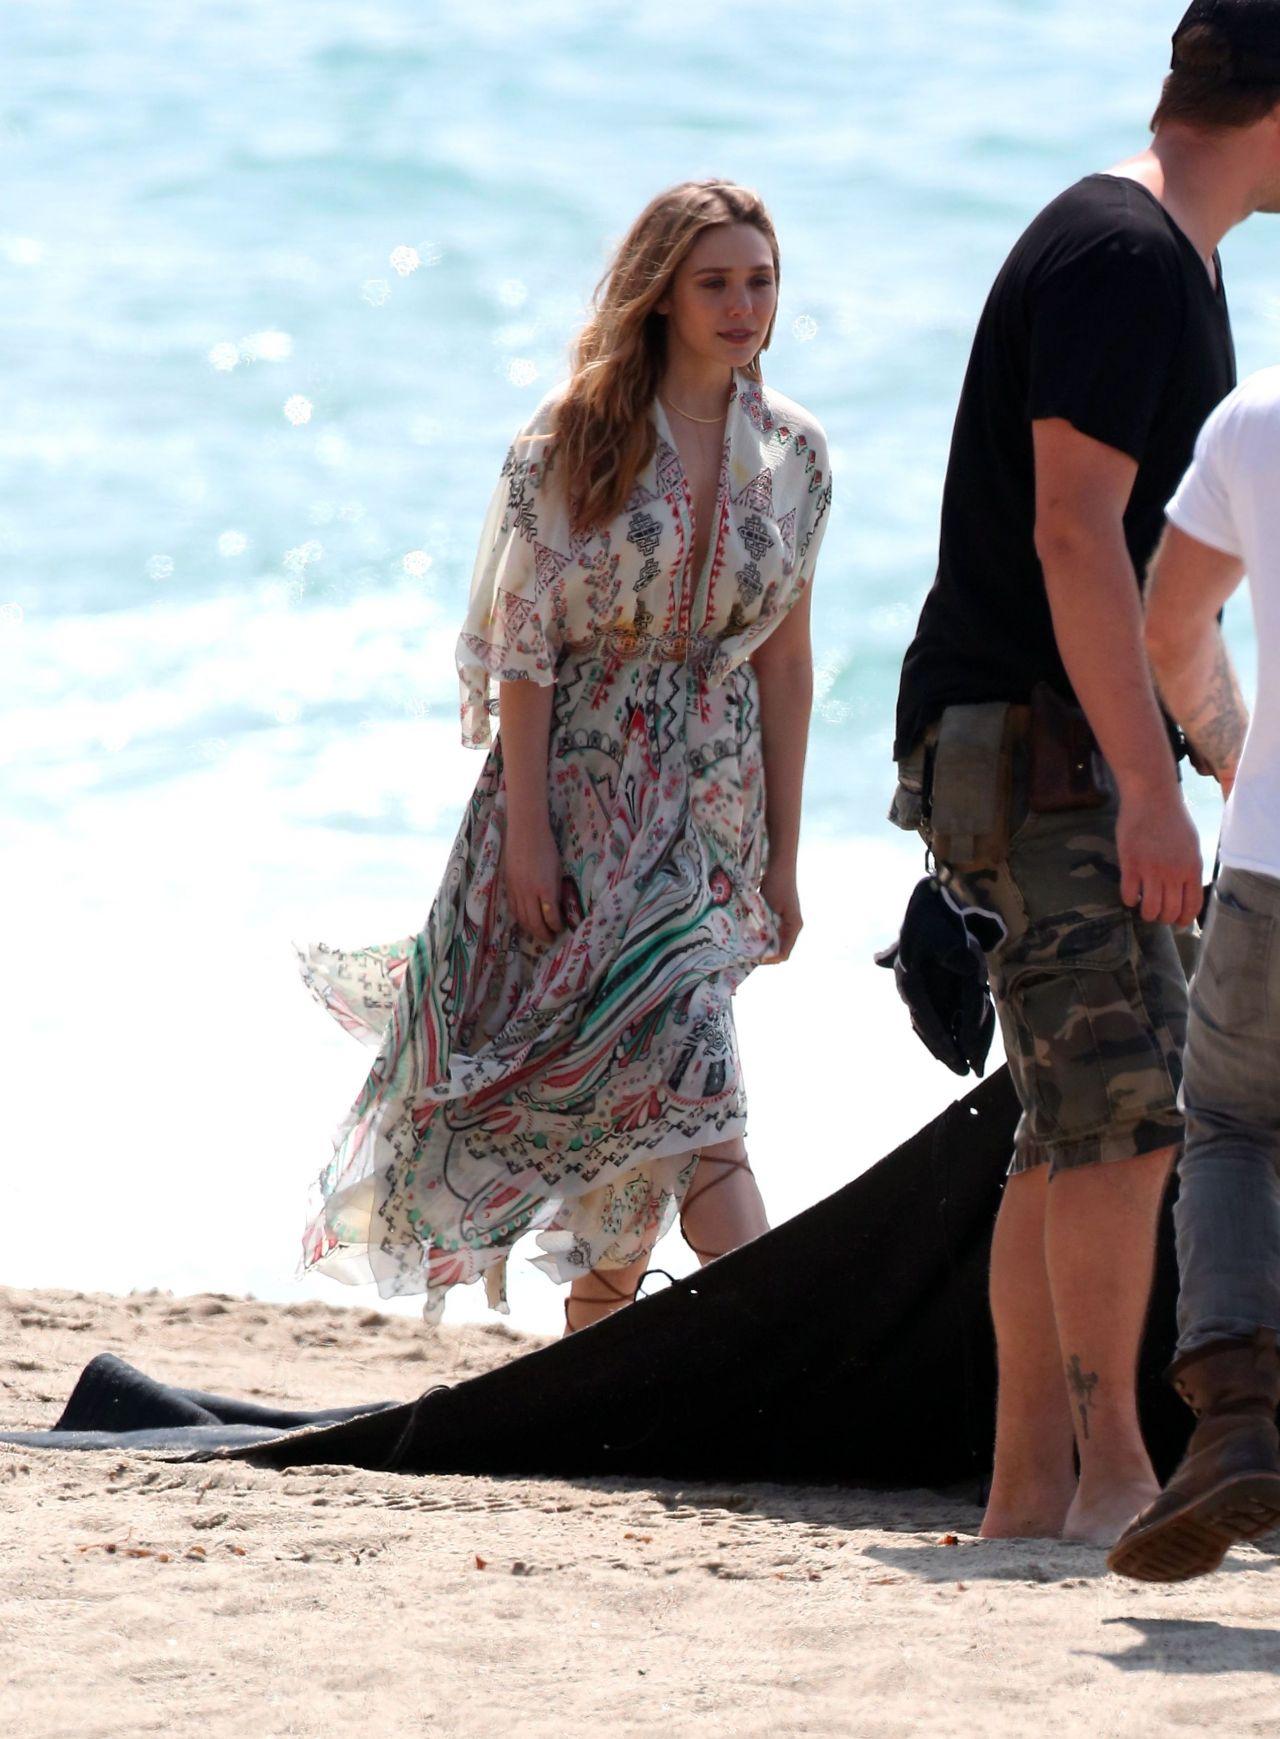 Elizabeth Olsen Photoshoot At The Beach In Malibu March